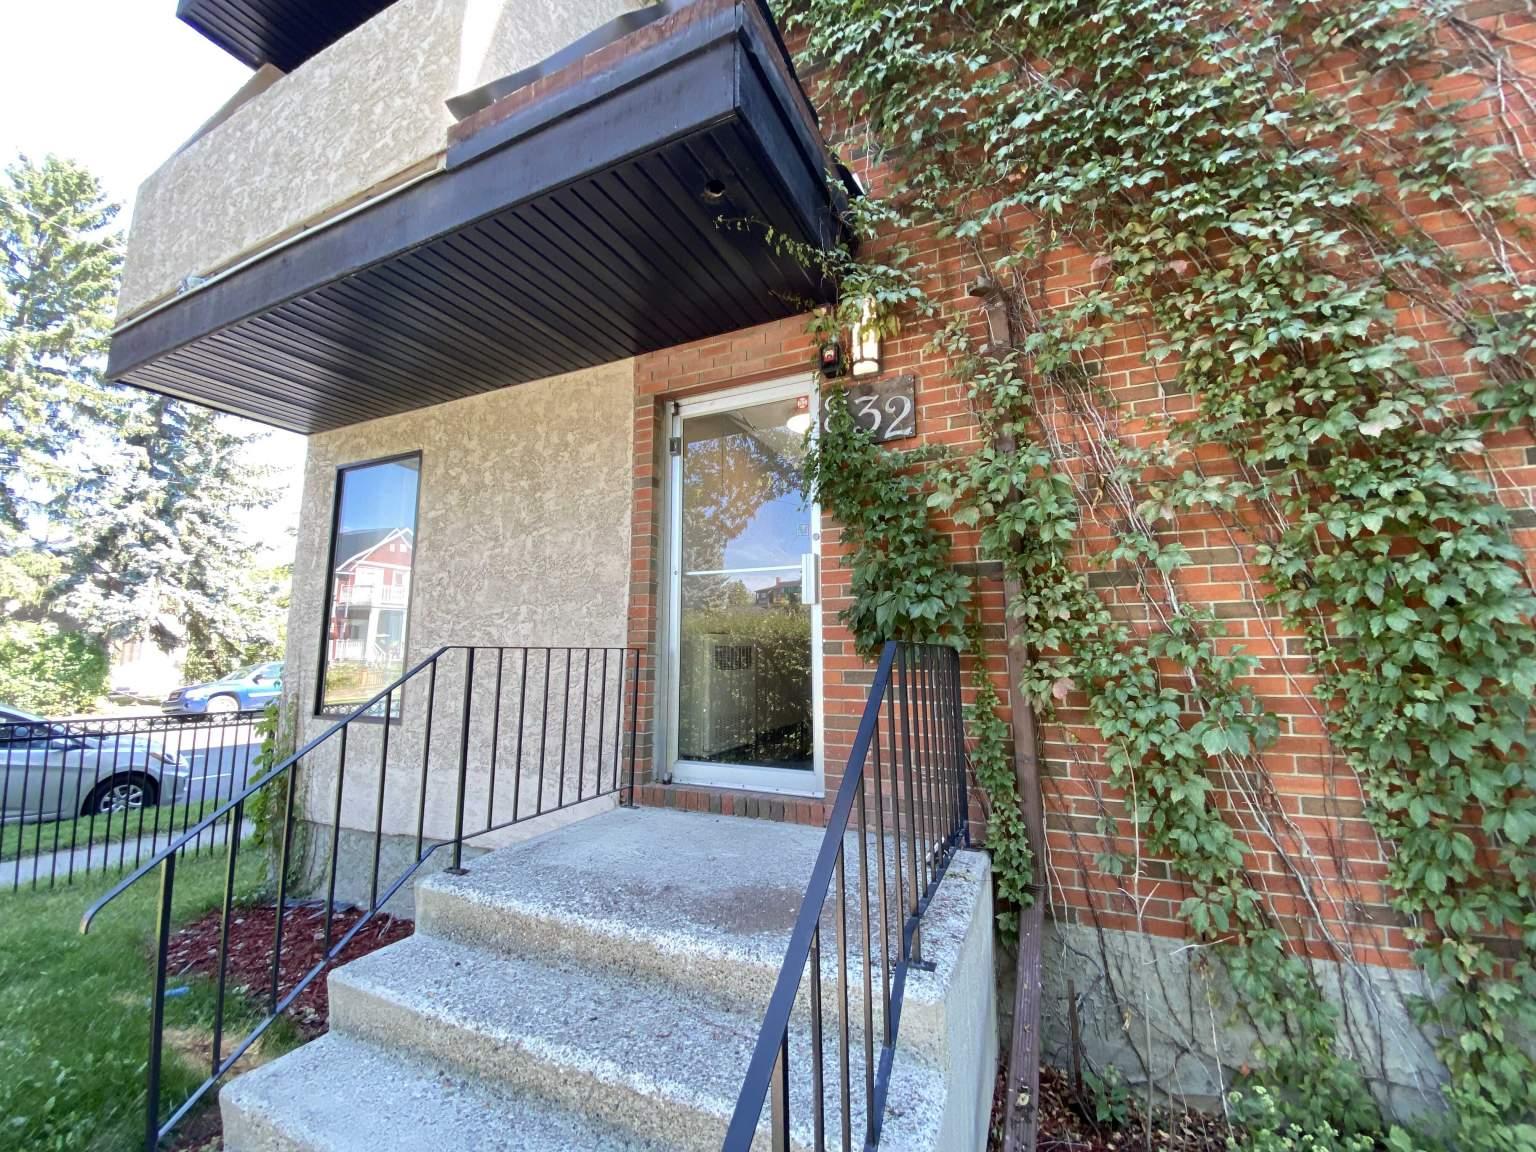 832 4a Street NE, Calgary, AB - 725 CAD/ month